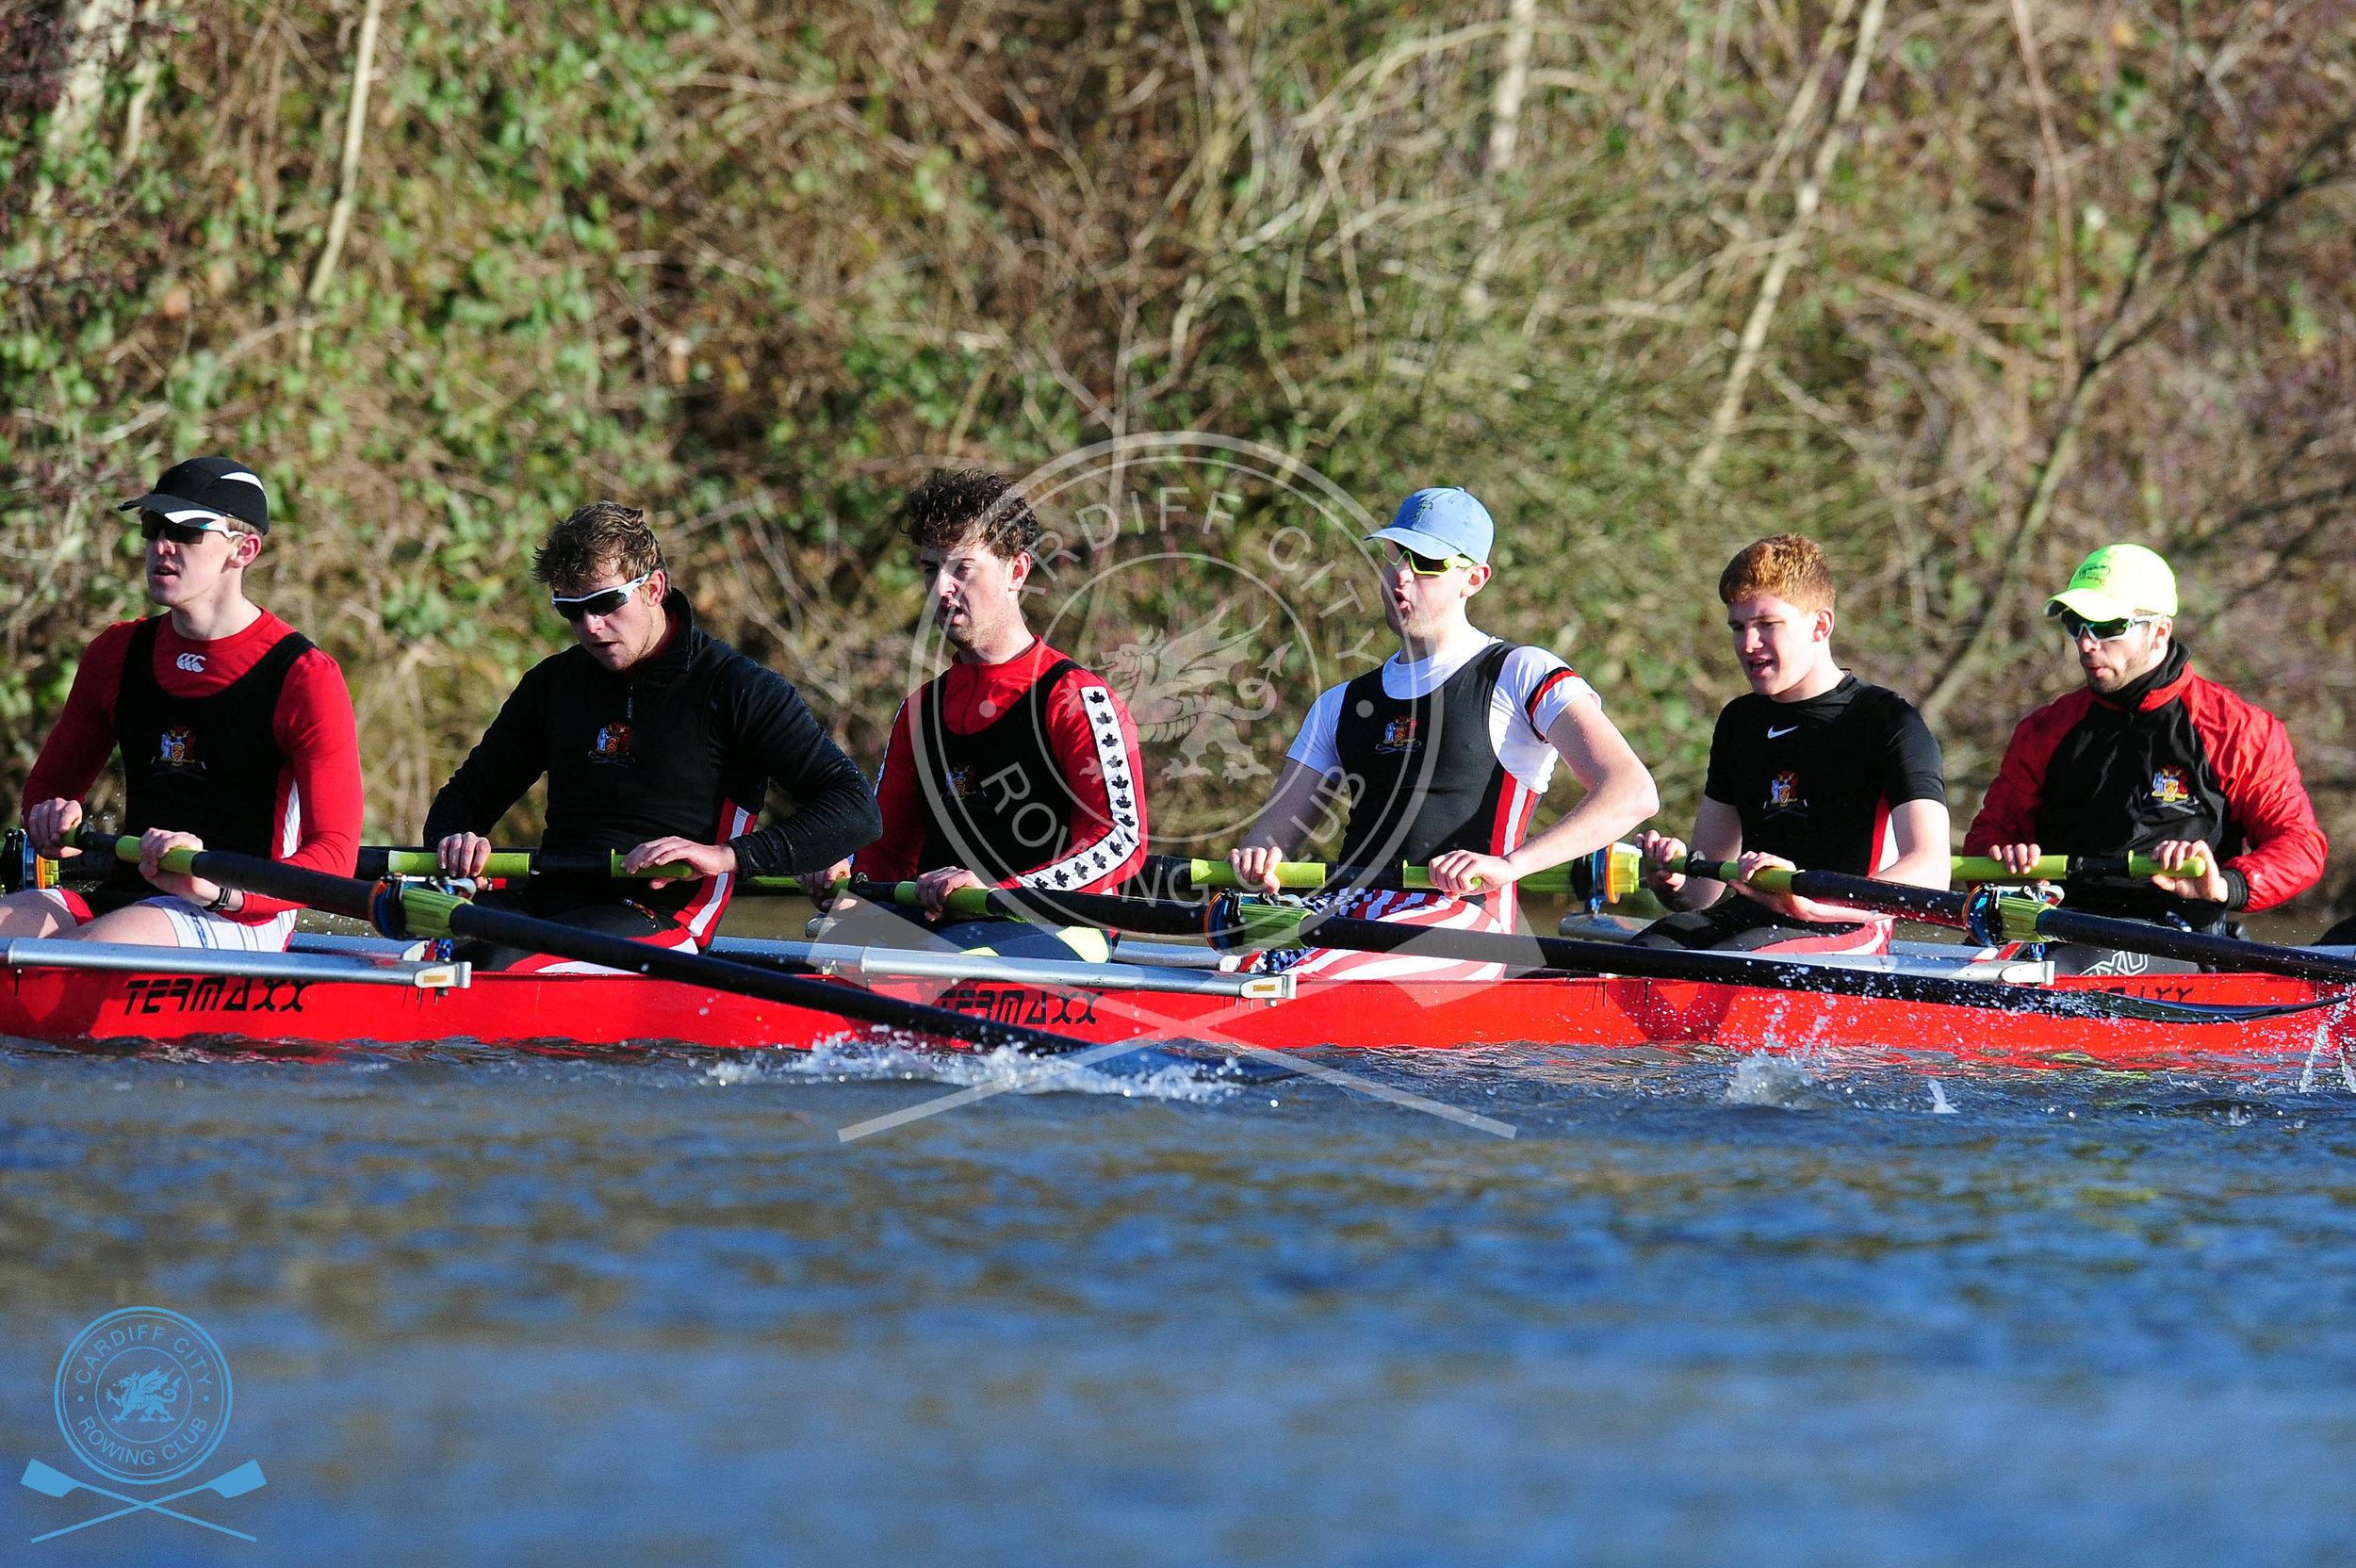 DW_280119_Cardiff_City_Rowing_229.jpg